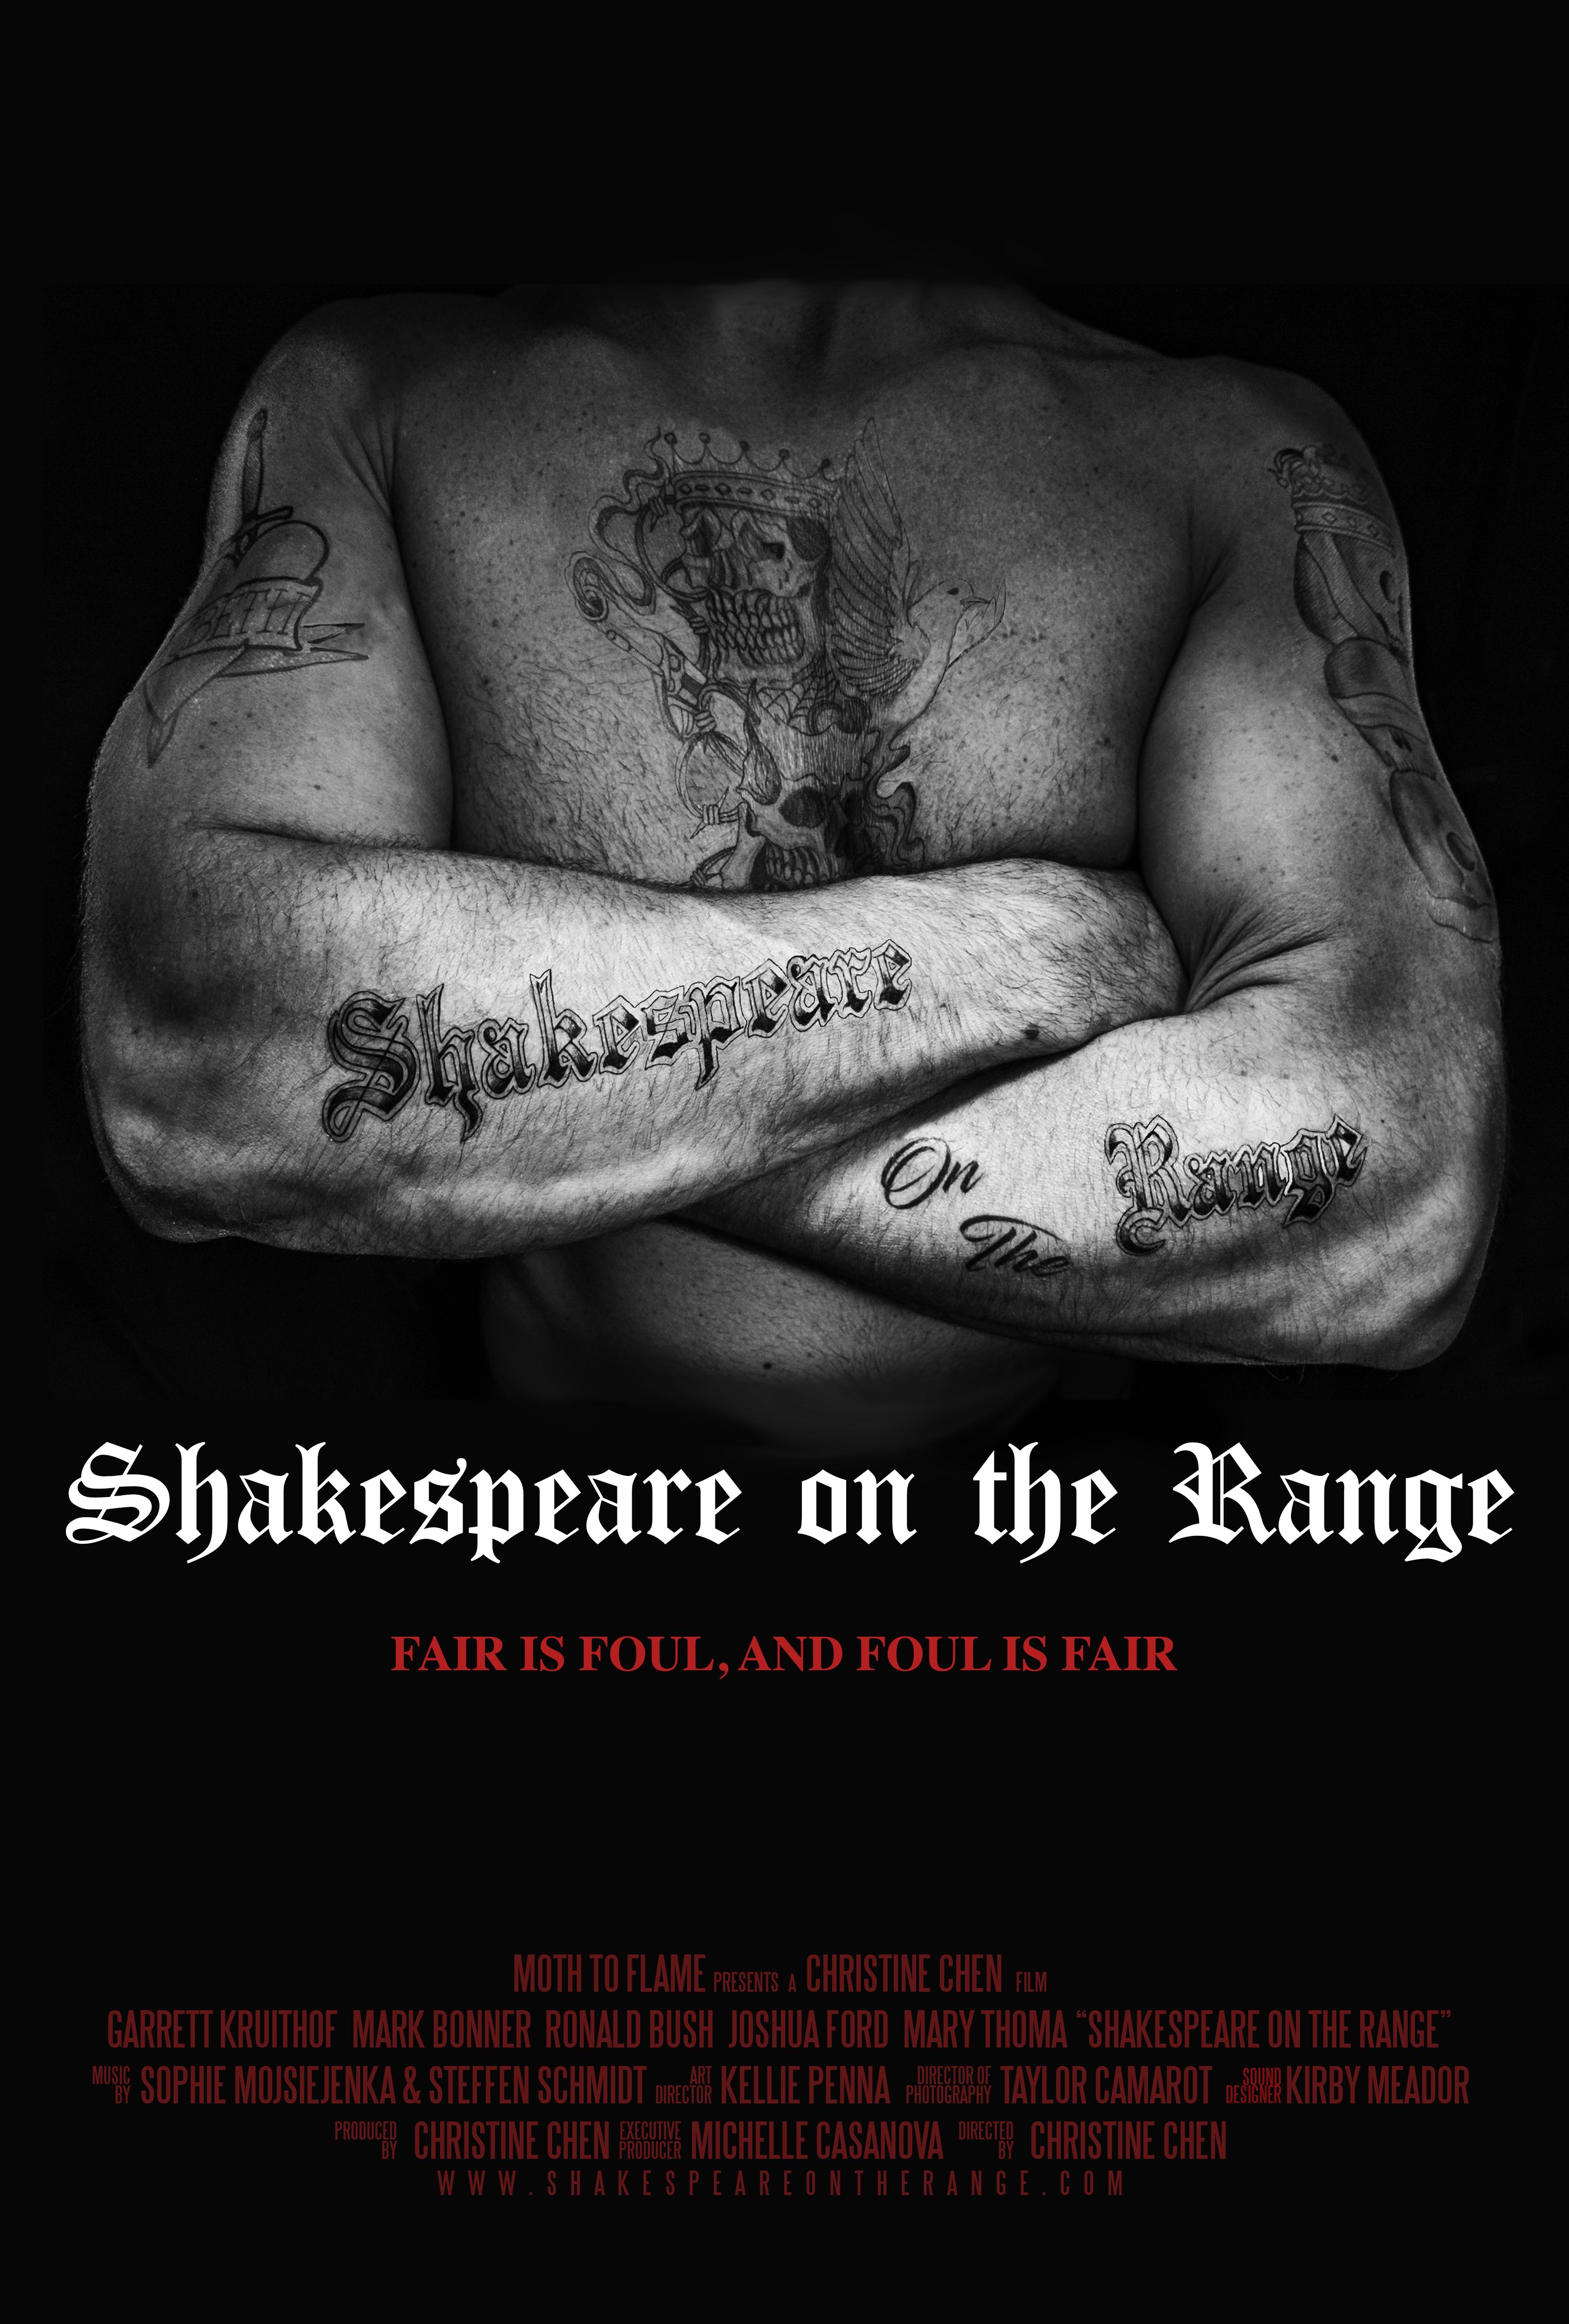 Shakespeare on the Range movie poster